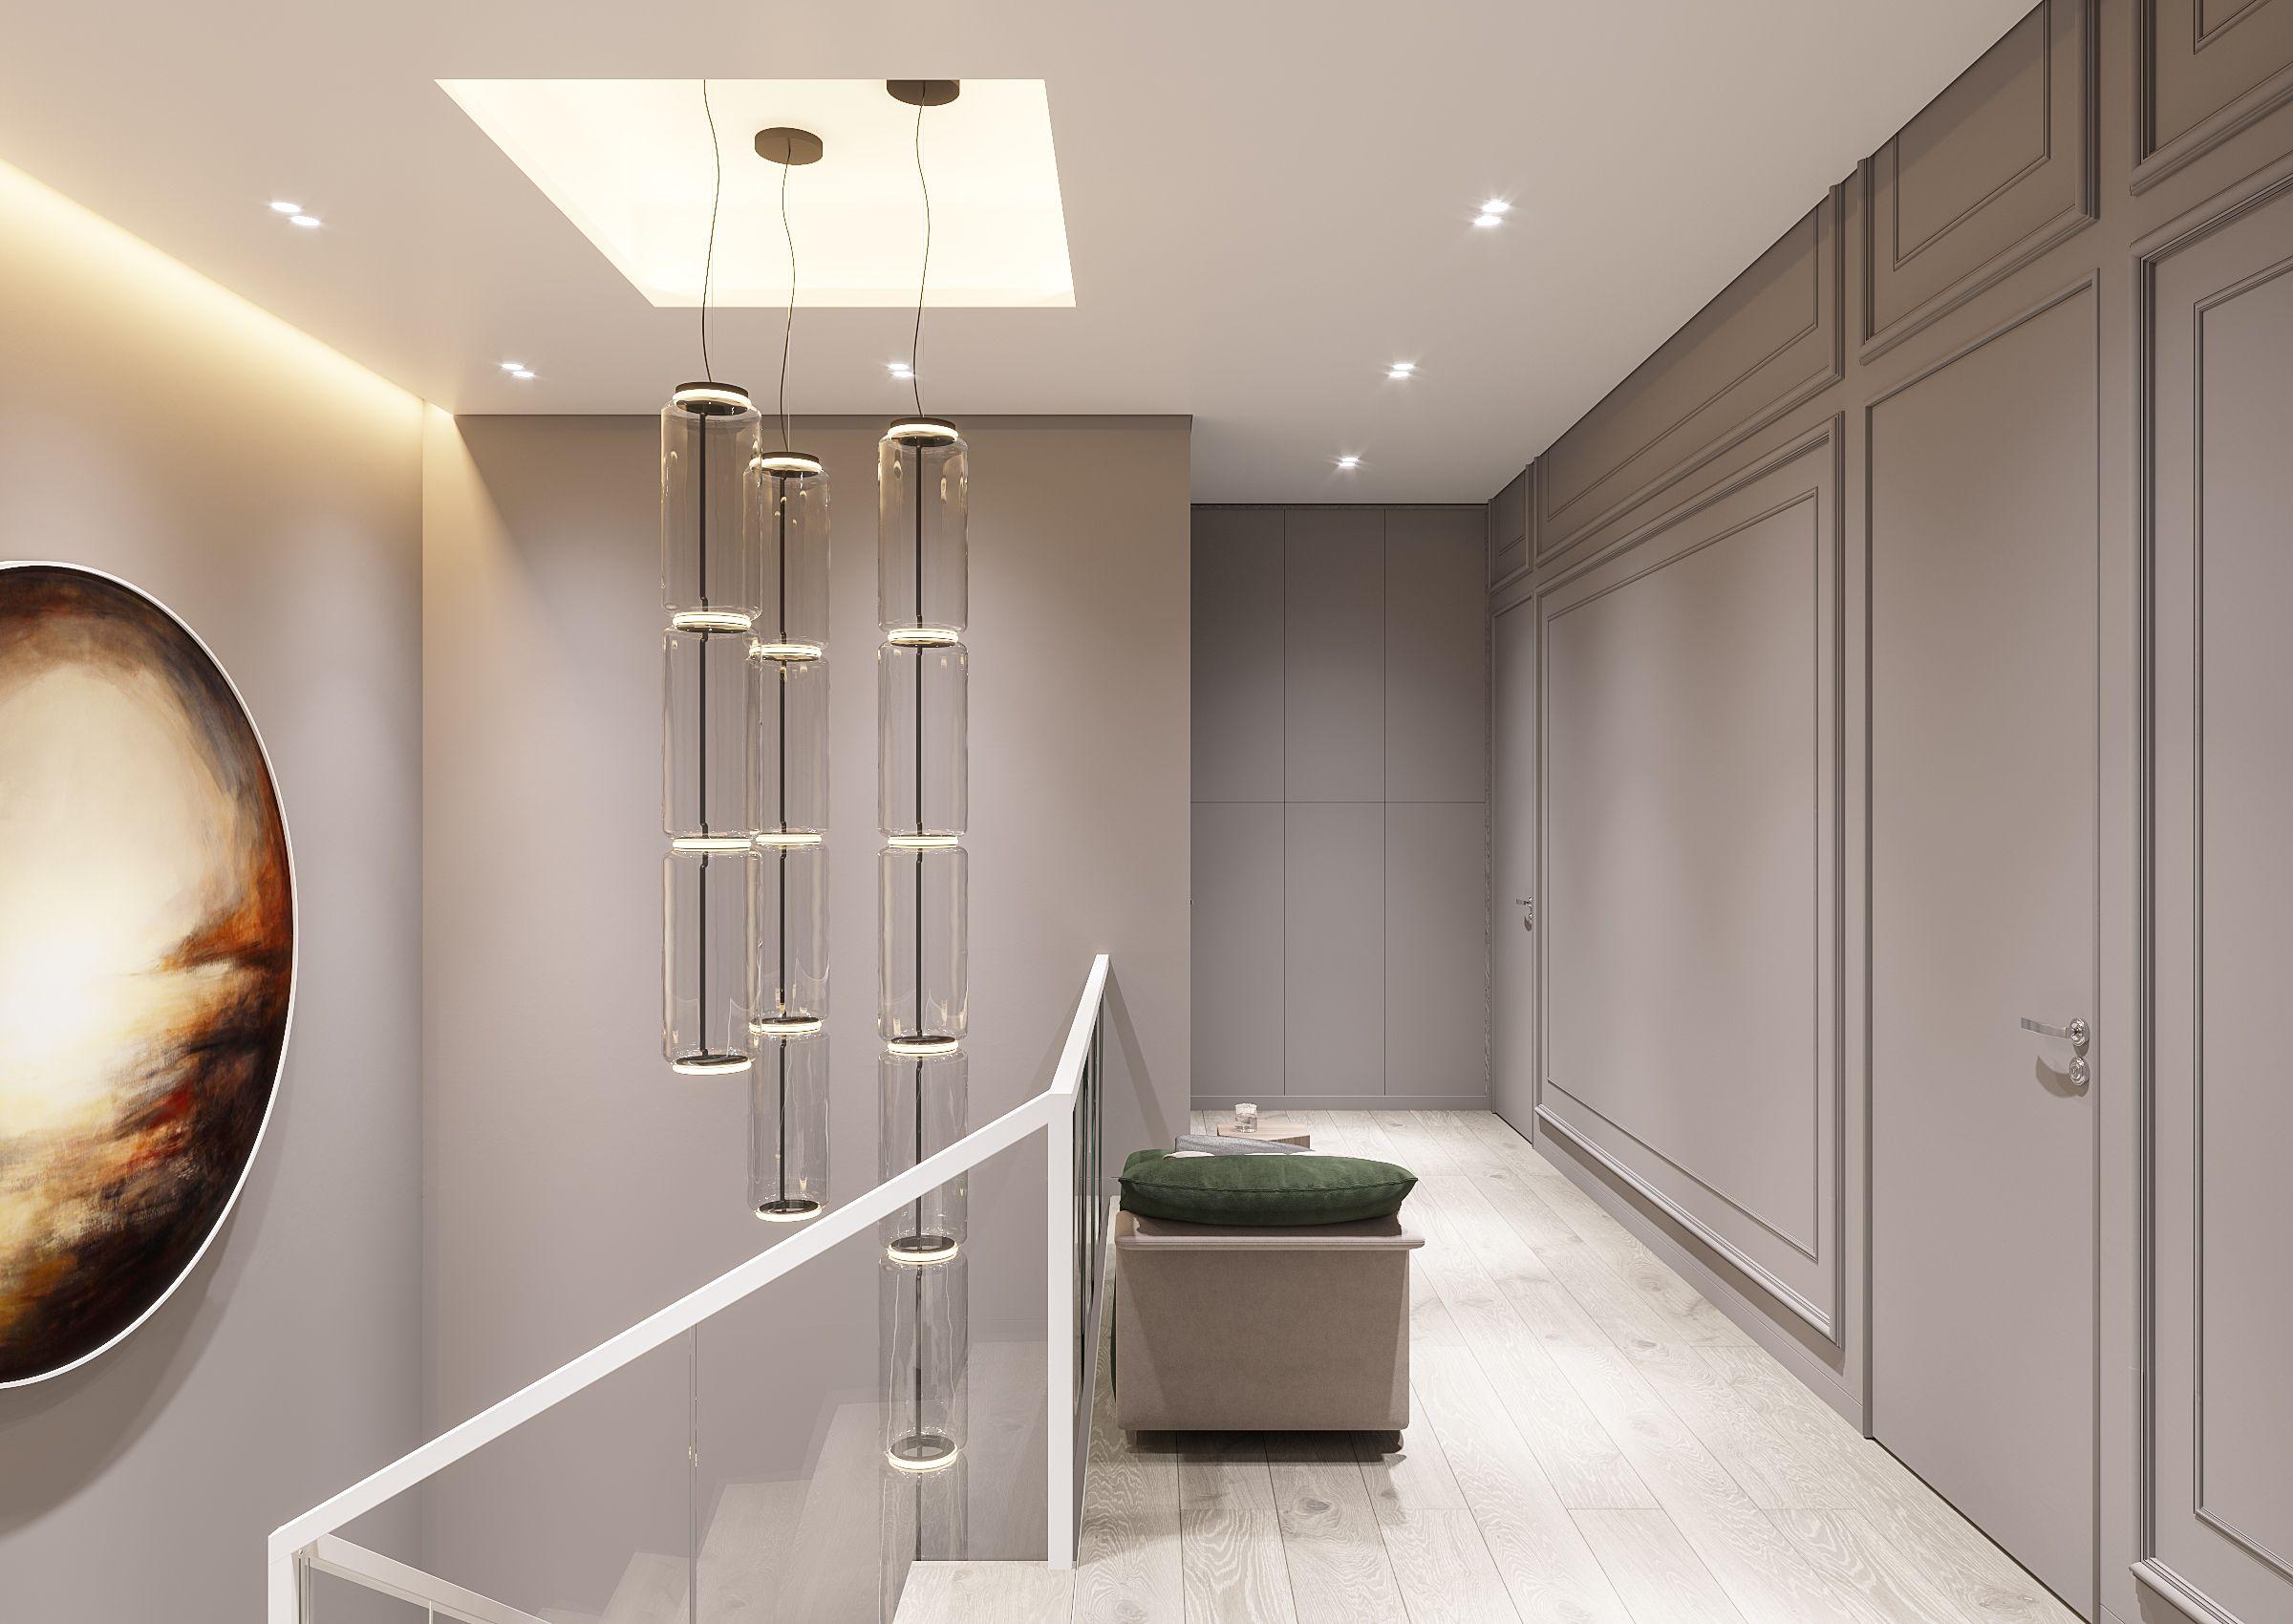 design de interior minimalist hol